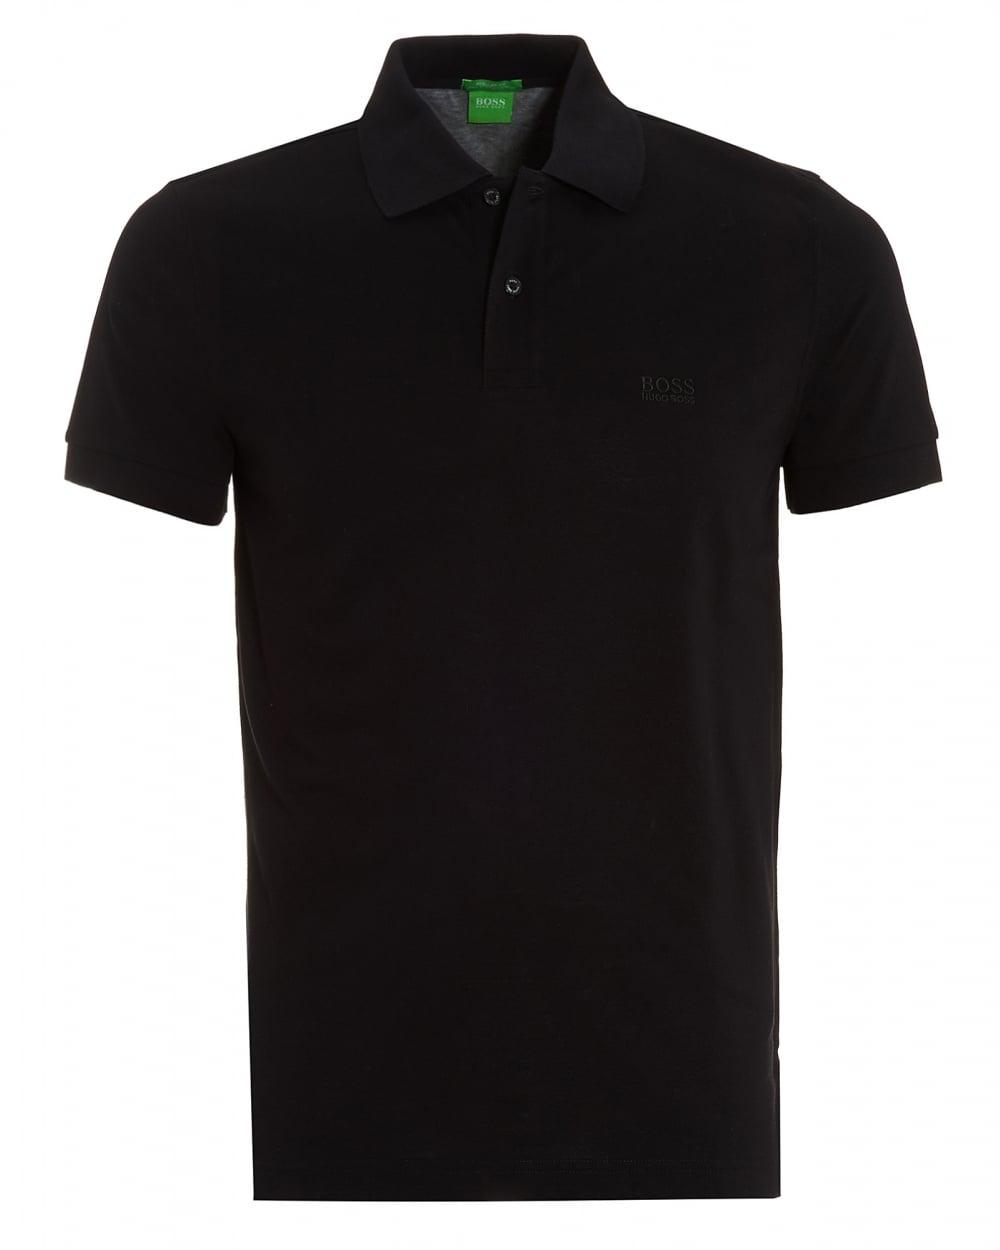 4880919a Hugo Boss Green Mens C-Firenze/Logo Polo, Regular Fit Black Polo Shirt